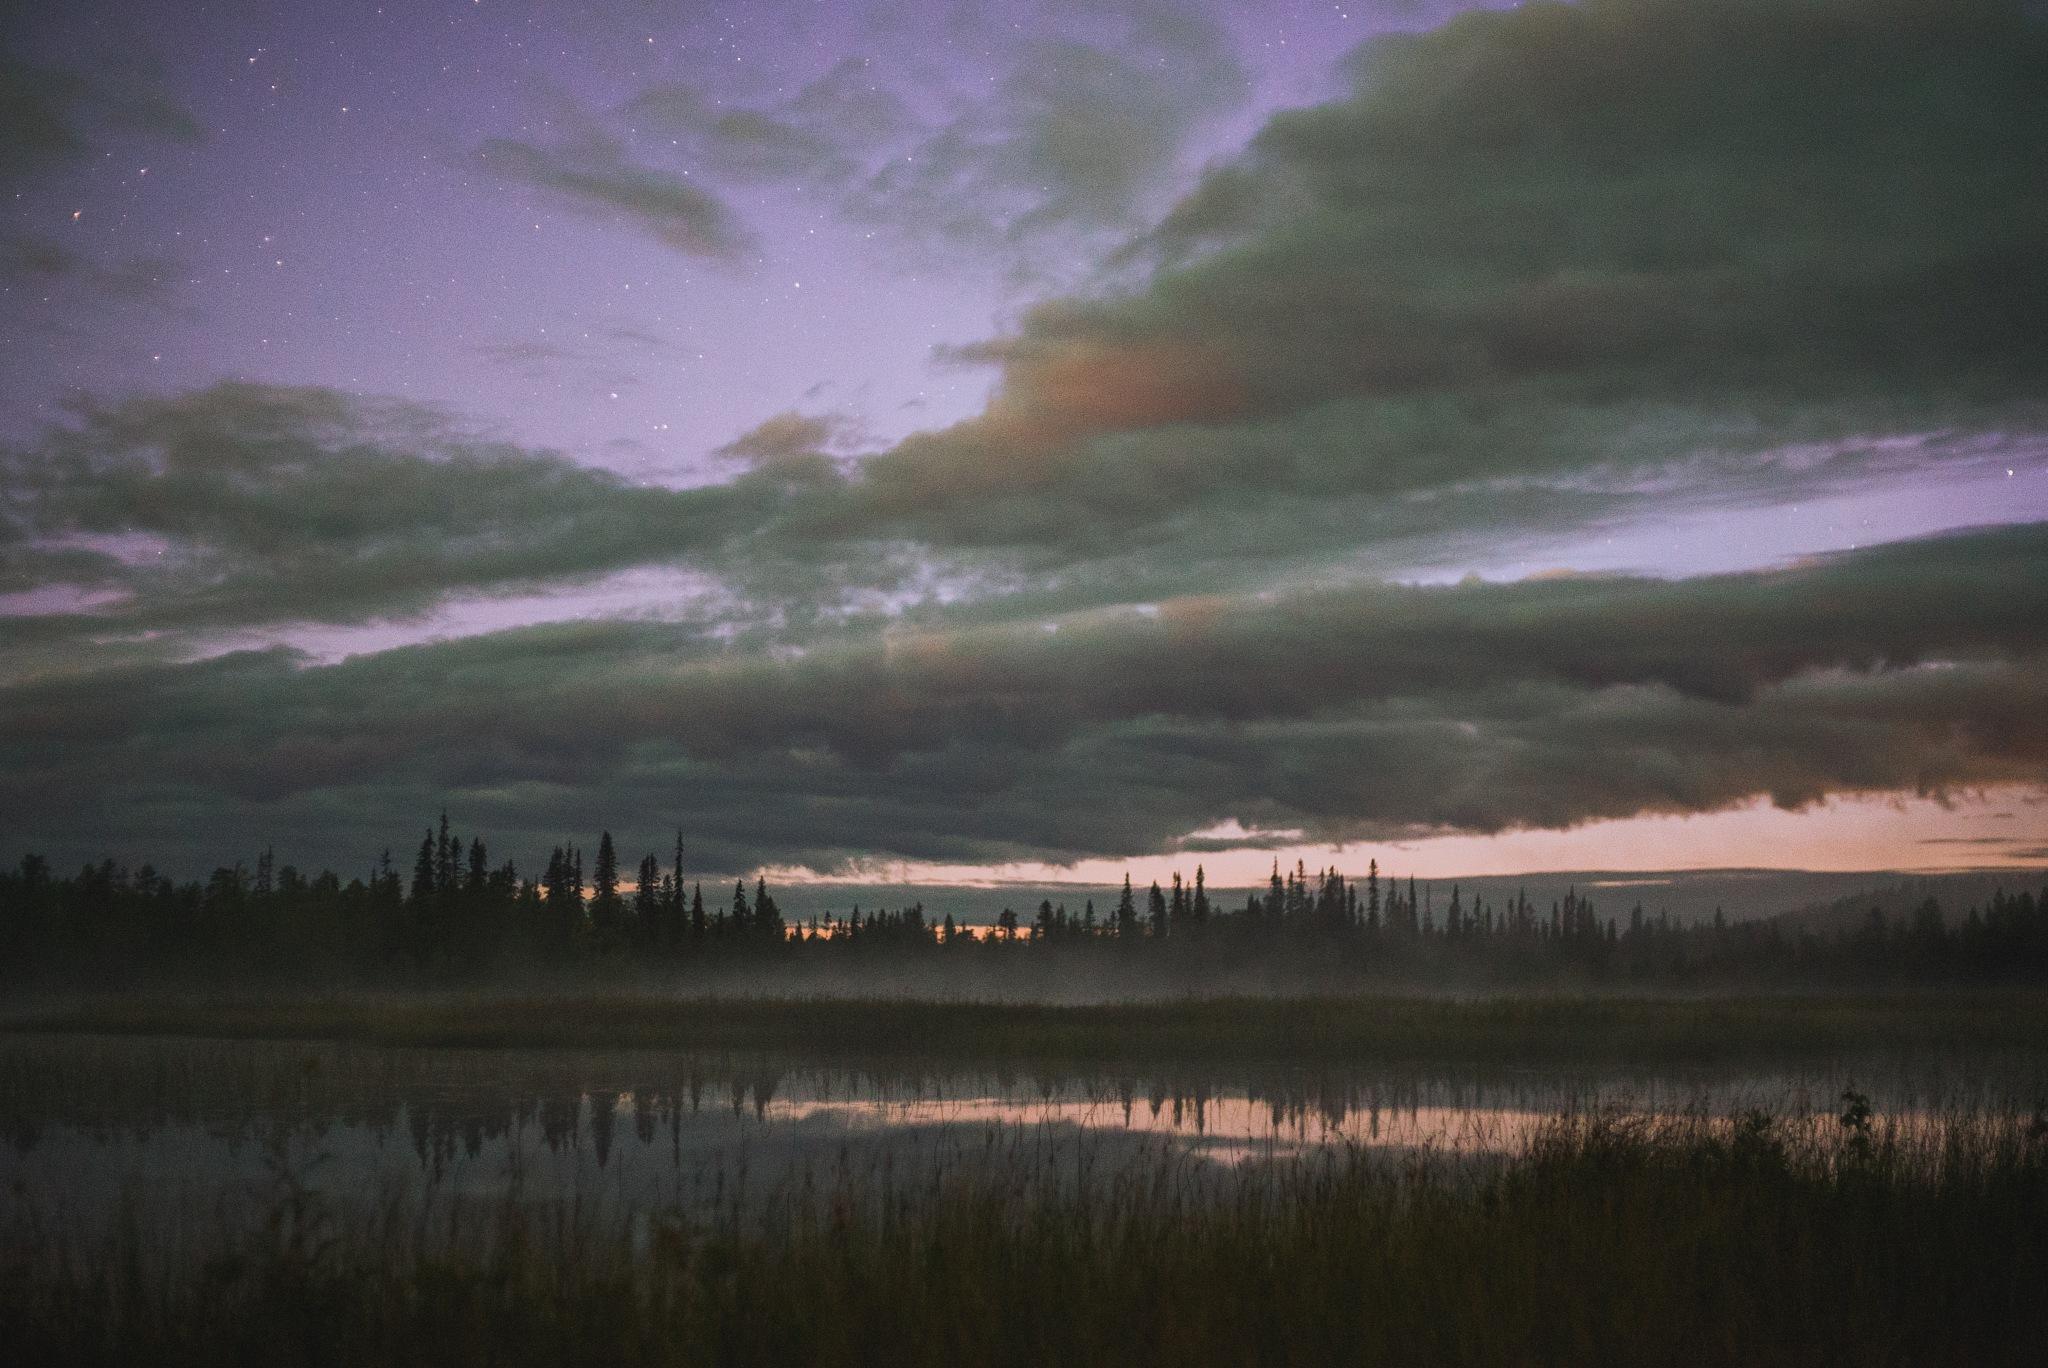 The Far Border by Juuso Voutilainen